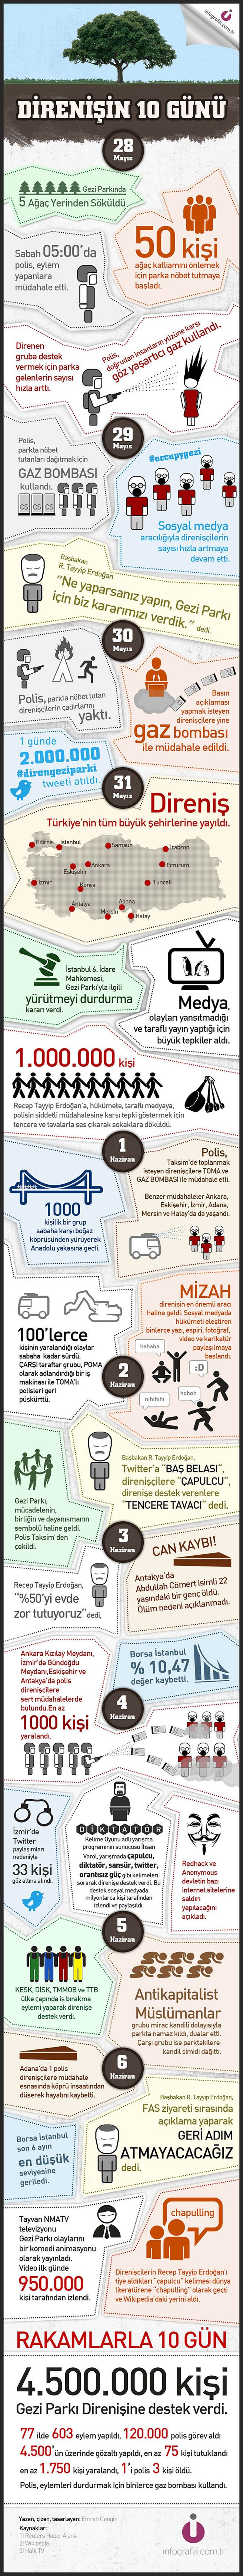 Gezi Park Infographic #occupygezi